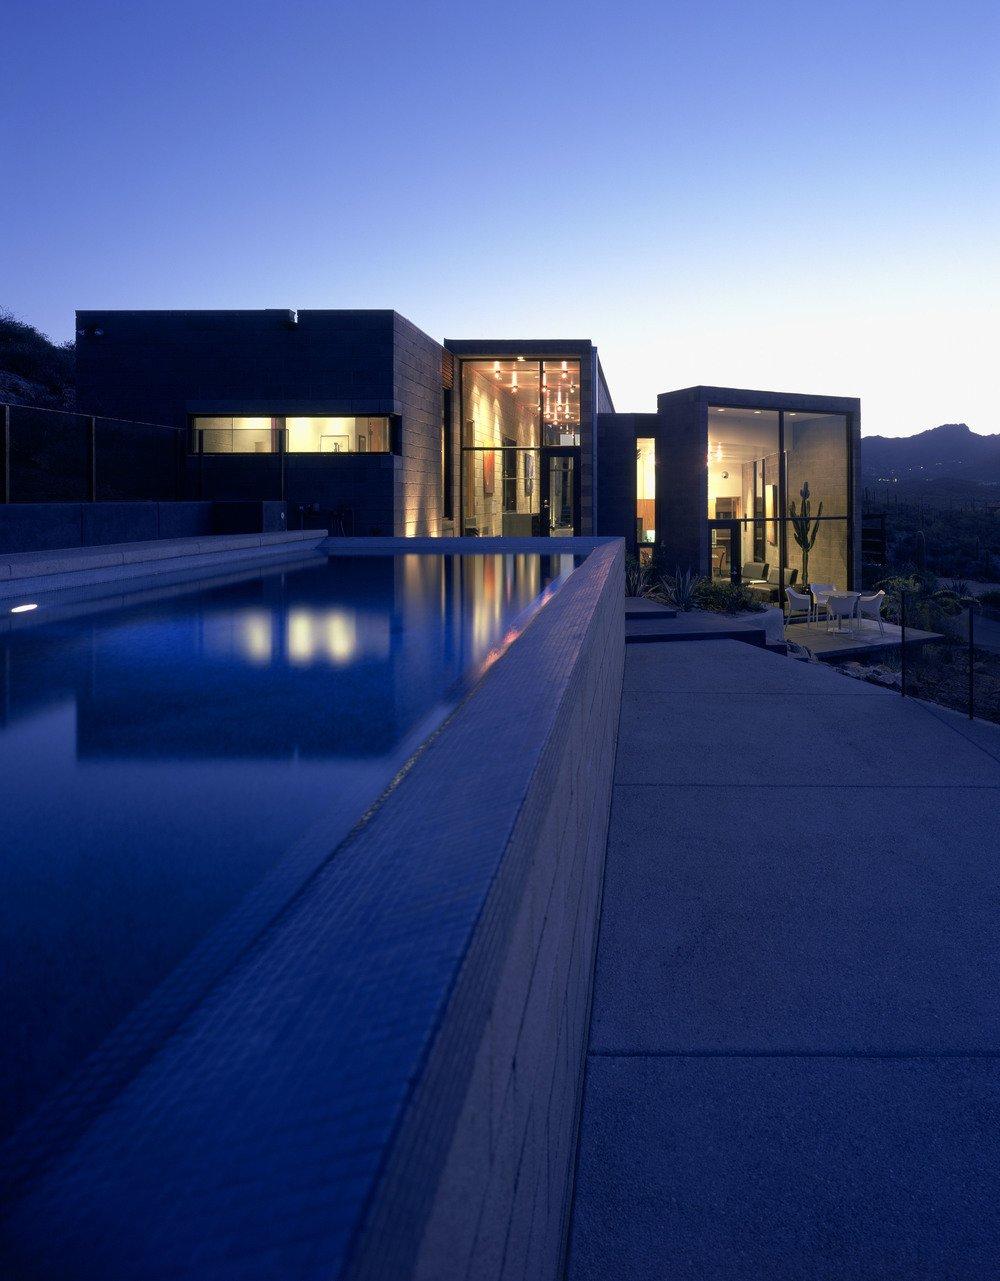 #modern #garciaresidence #ibarrarosanodesignarchitects #architecture #landscape #exterior #arizona #backyard #outdoor #seatingdesign #pooldesign #dining #openfloor  Garcia Residence